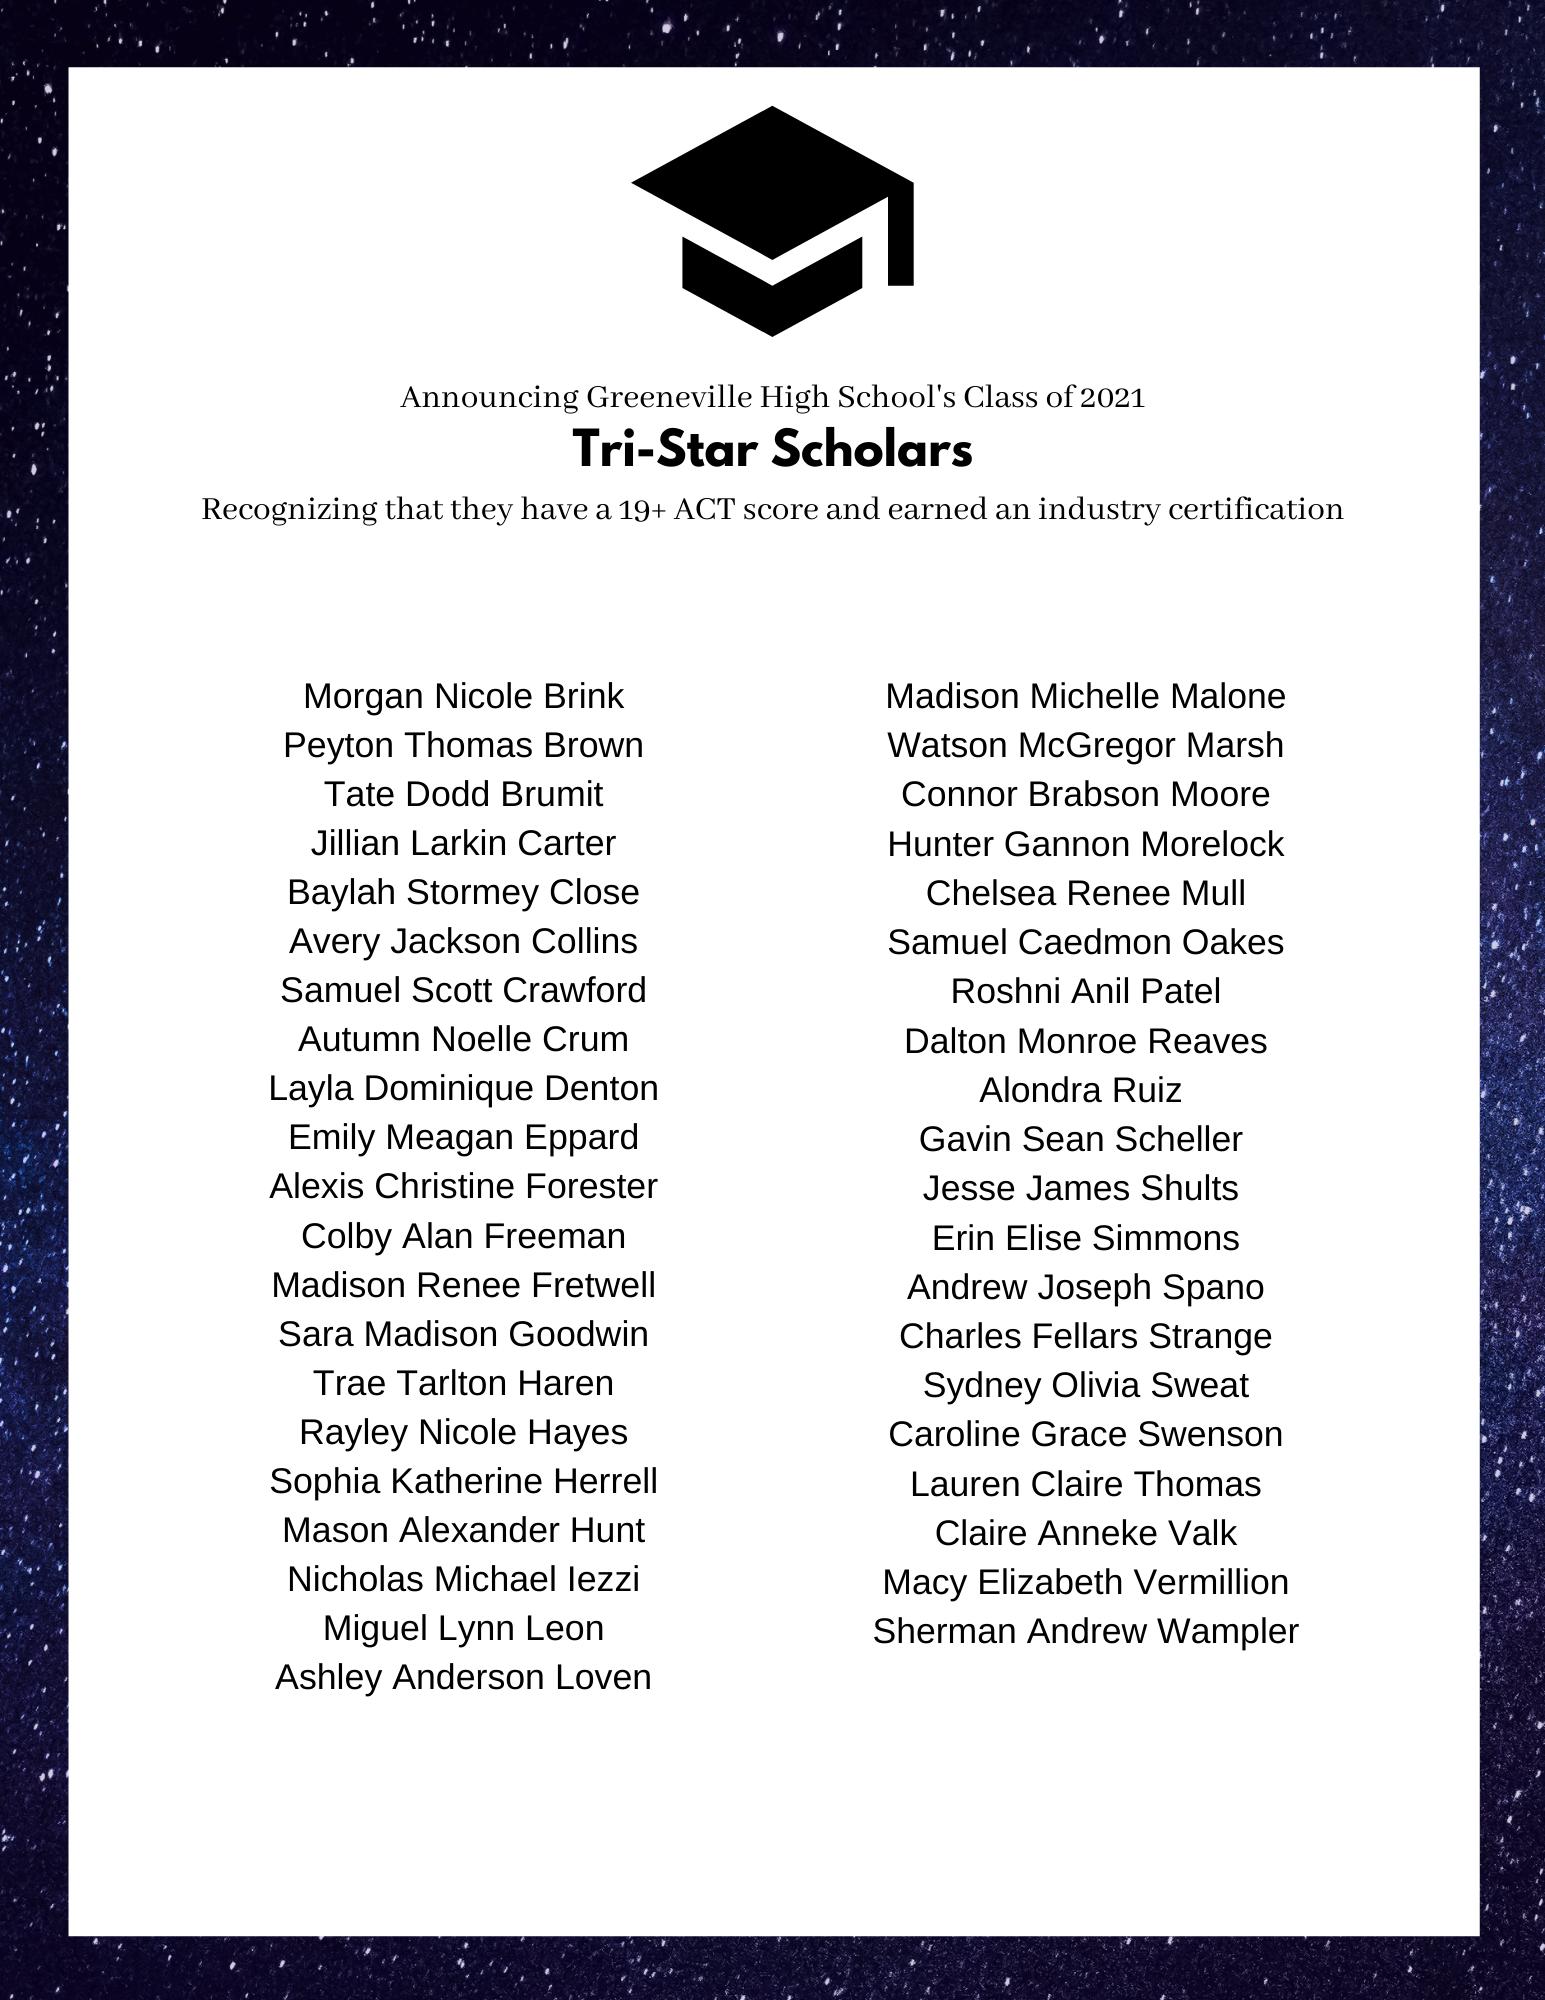 Class of 2021 Tri-Star Scholars